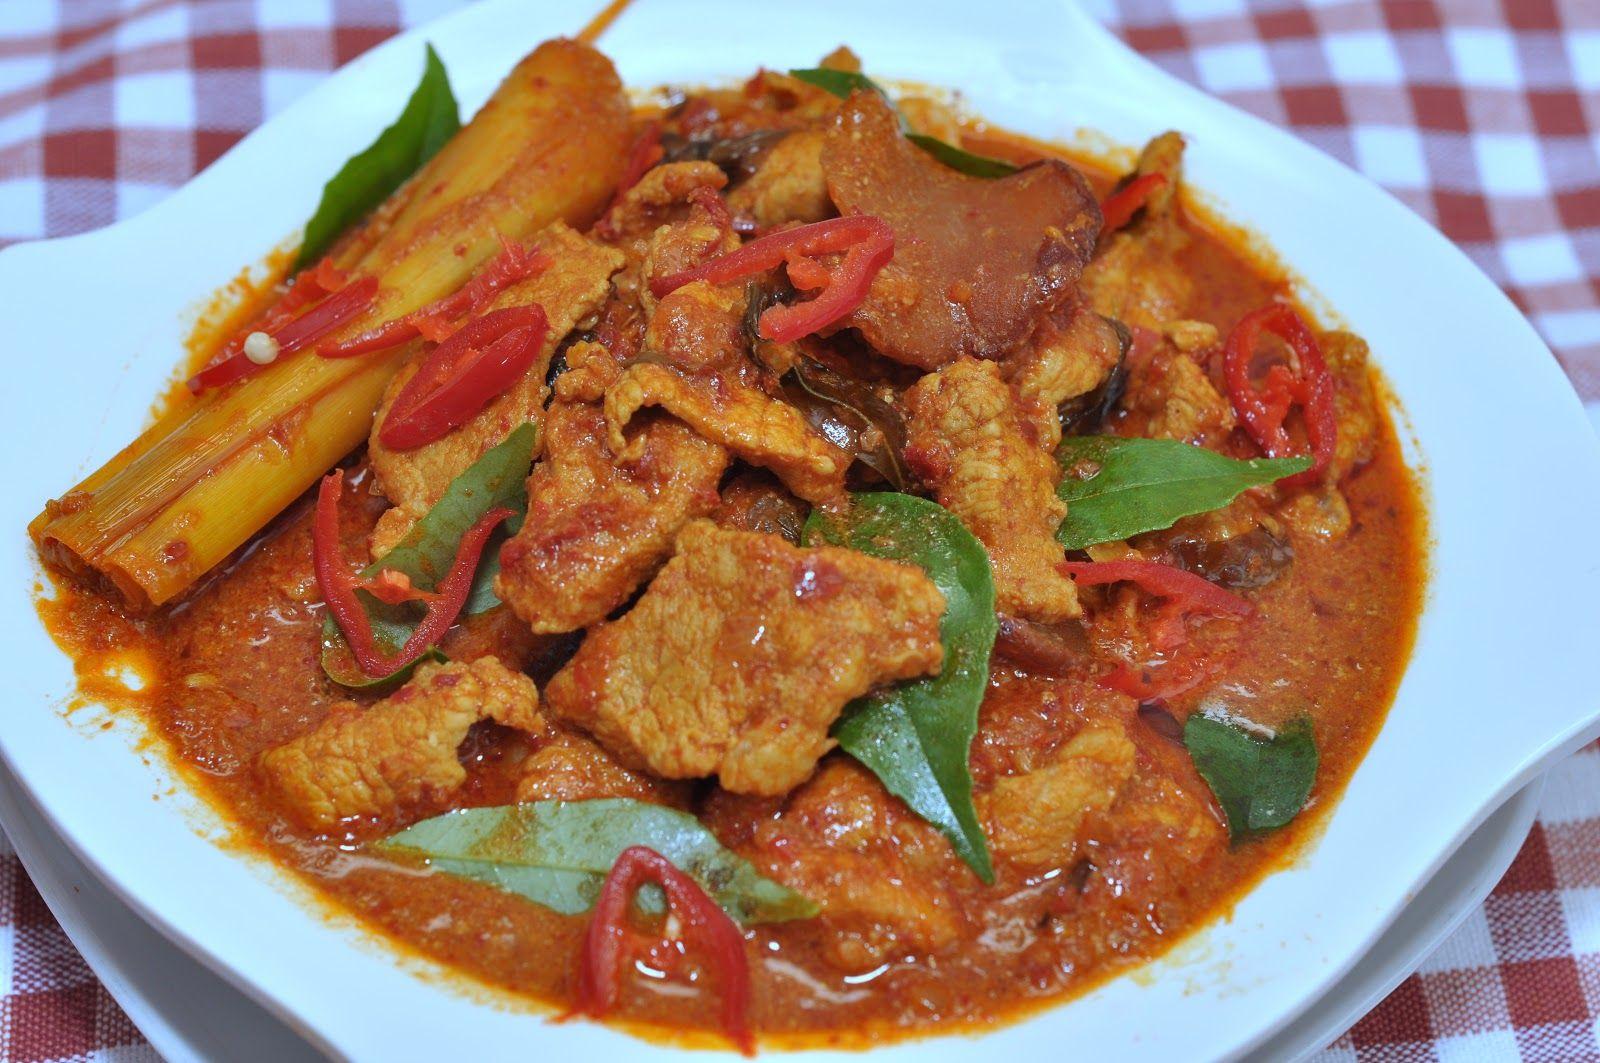 Veronica S Kitchen Assam Curry Pork 亚叁咖哩猪肉片 Pork